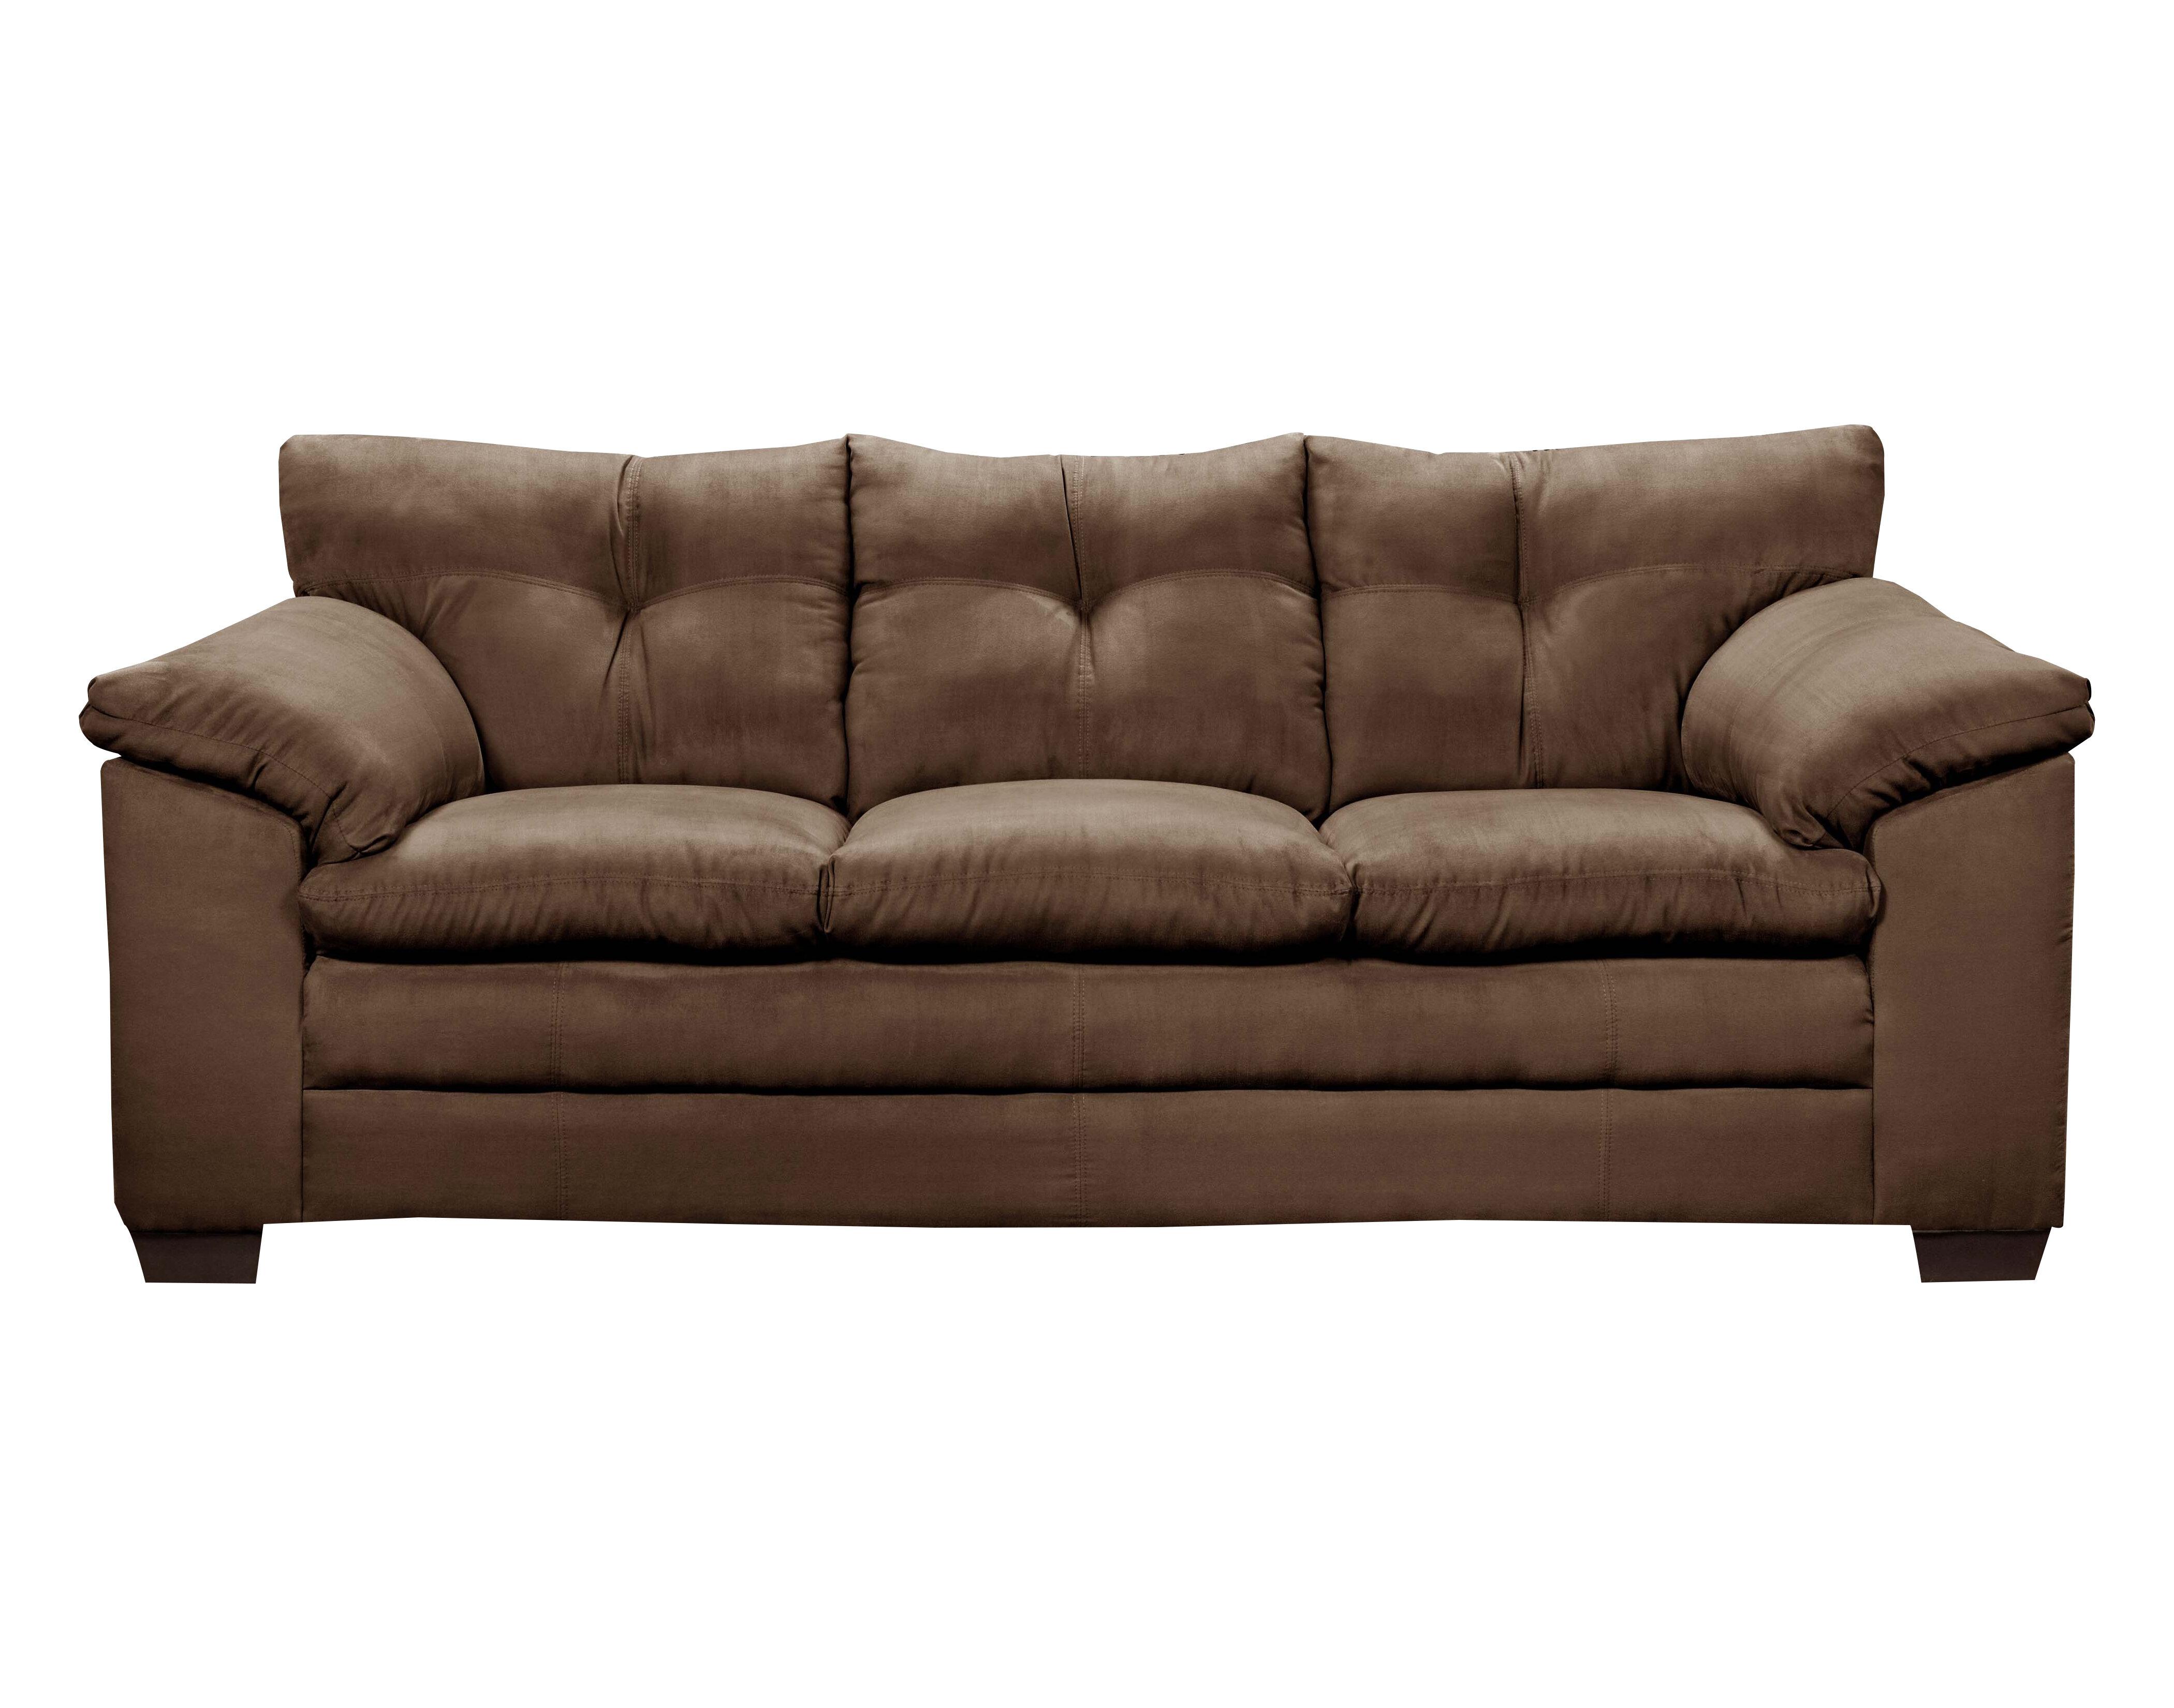 Three Posts Simmons Upholstery Richland Sofa Reviews Wayfair